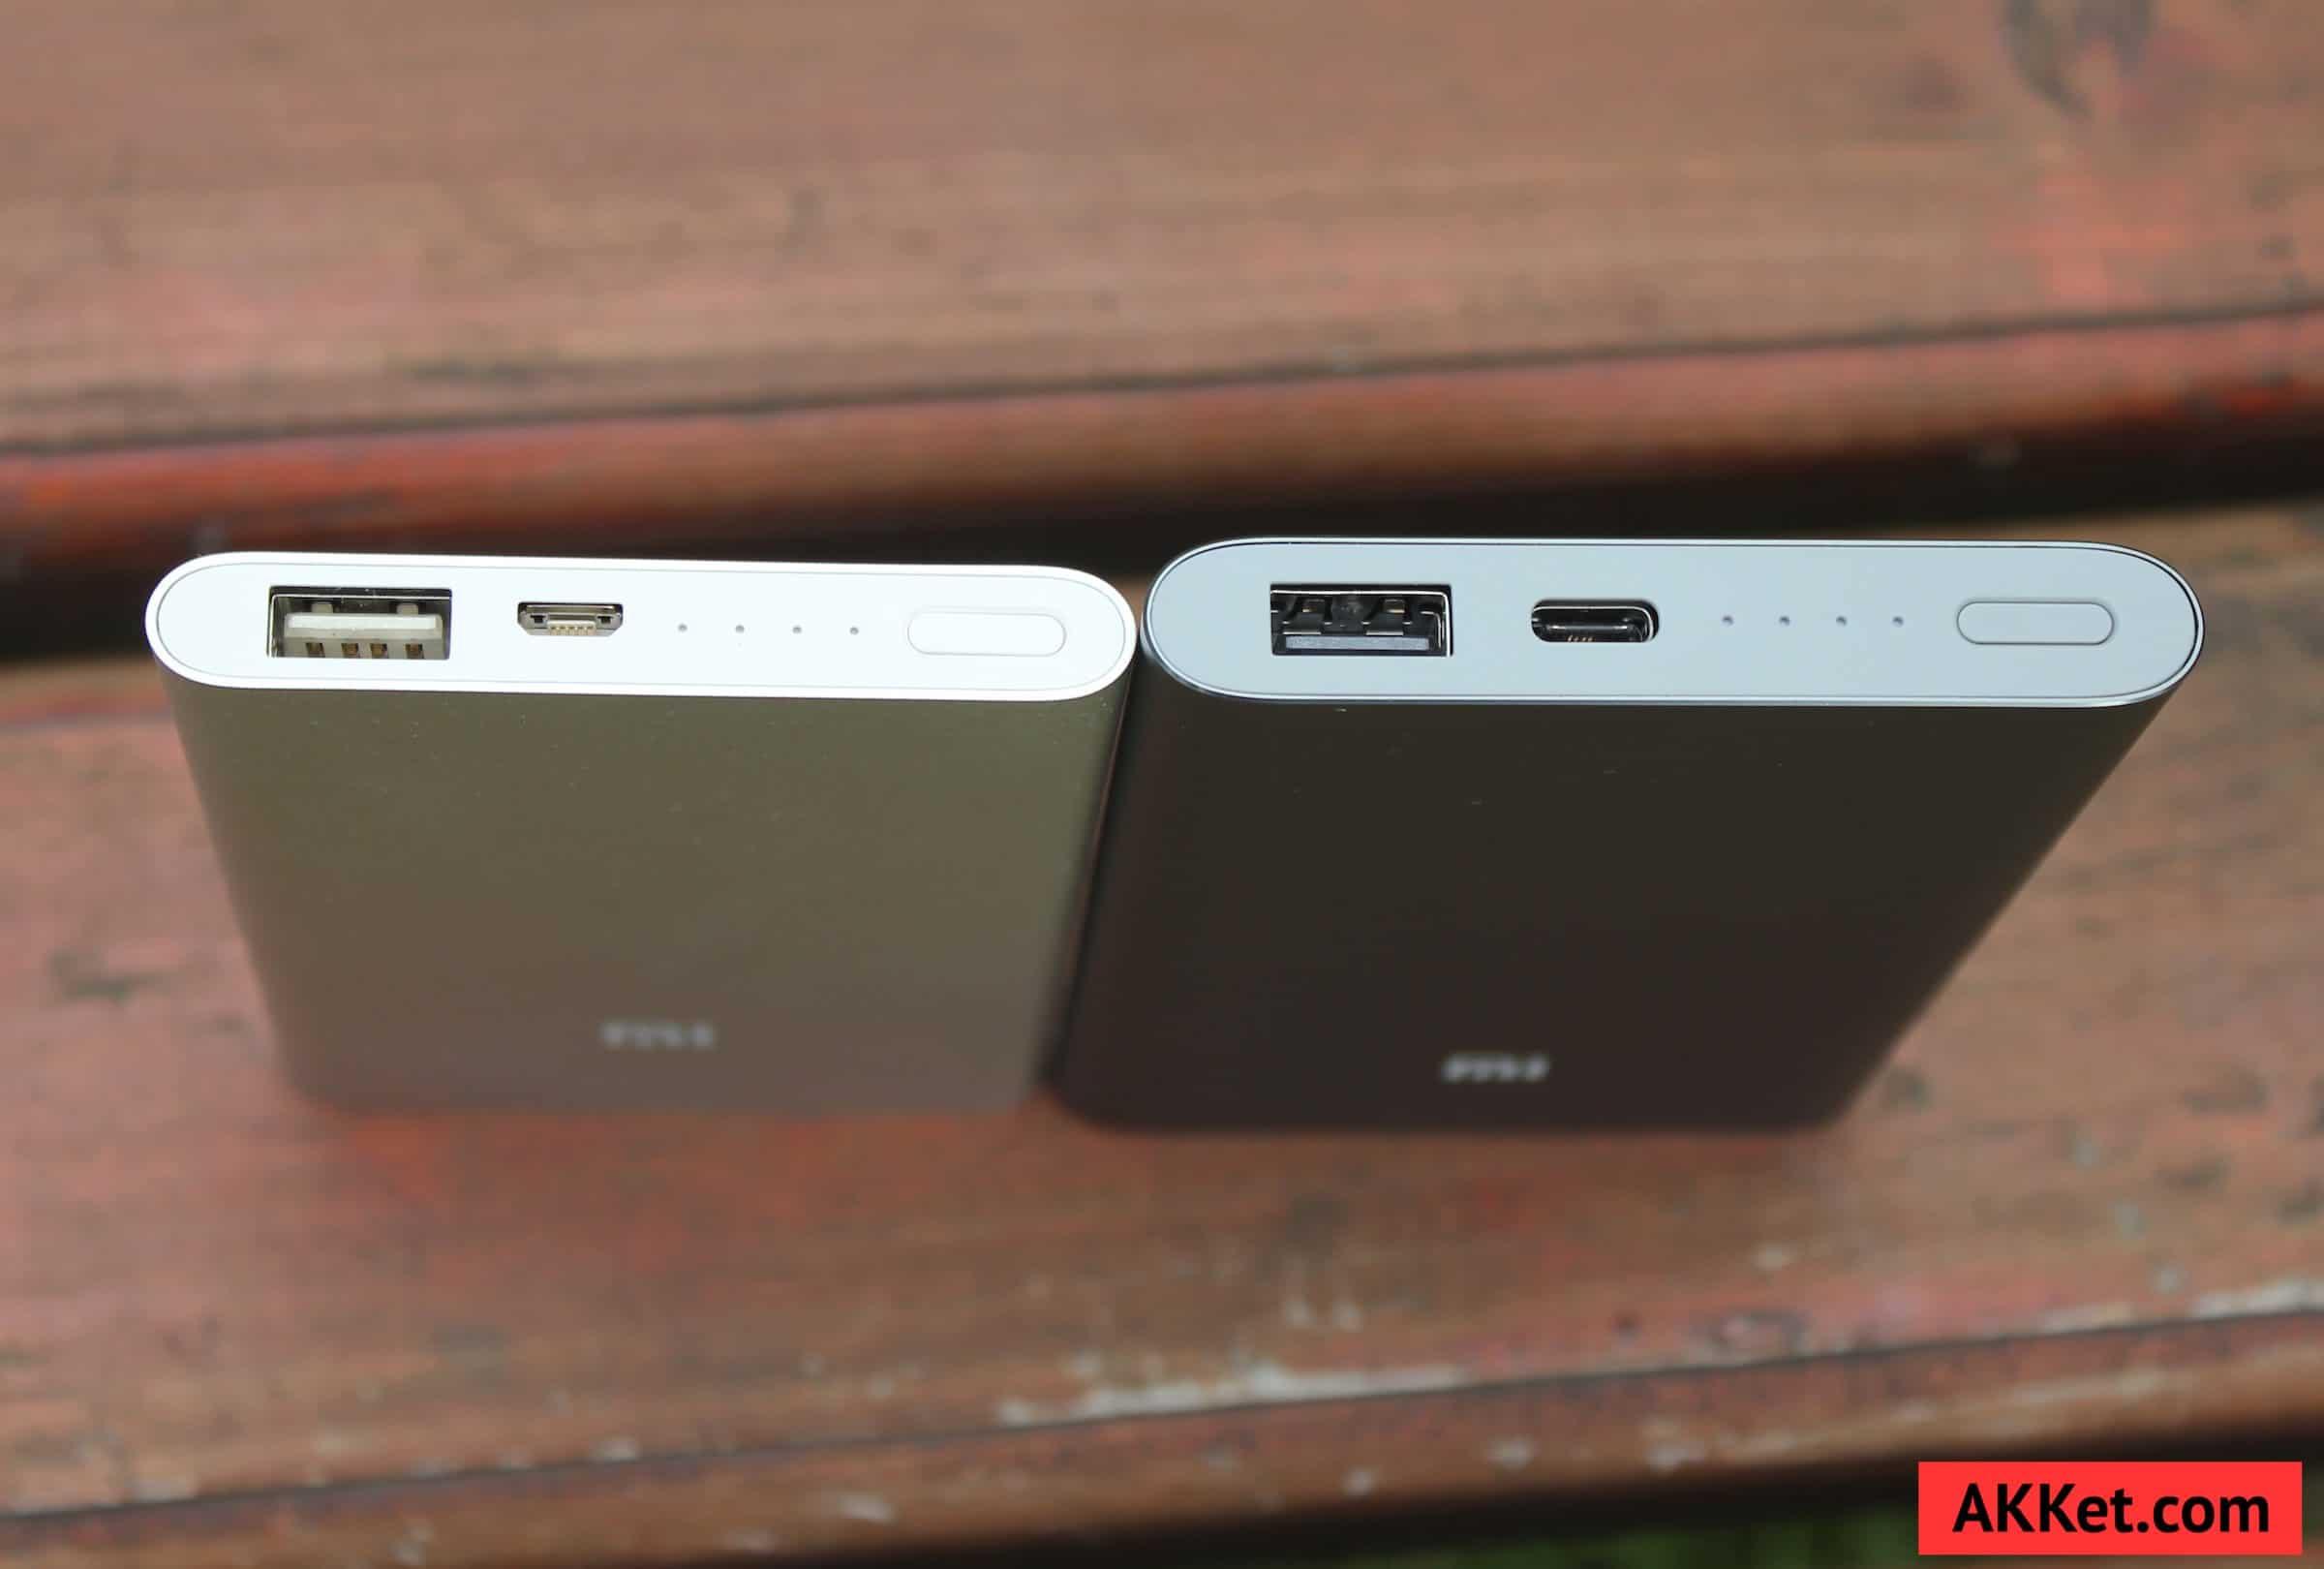 Xiaomi Mi Power Bank Pro 10000 мАч и Xiaomi Mi Power Bank 5000 мАч 6